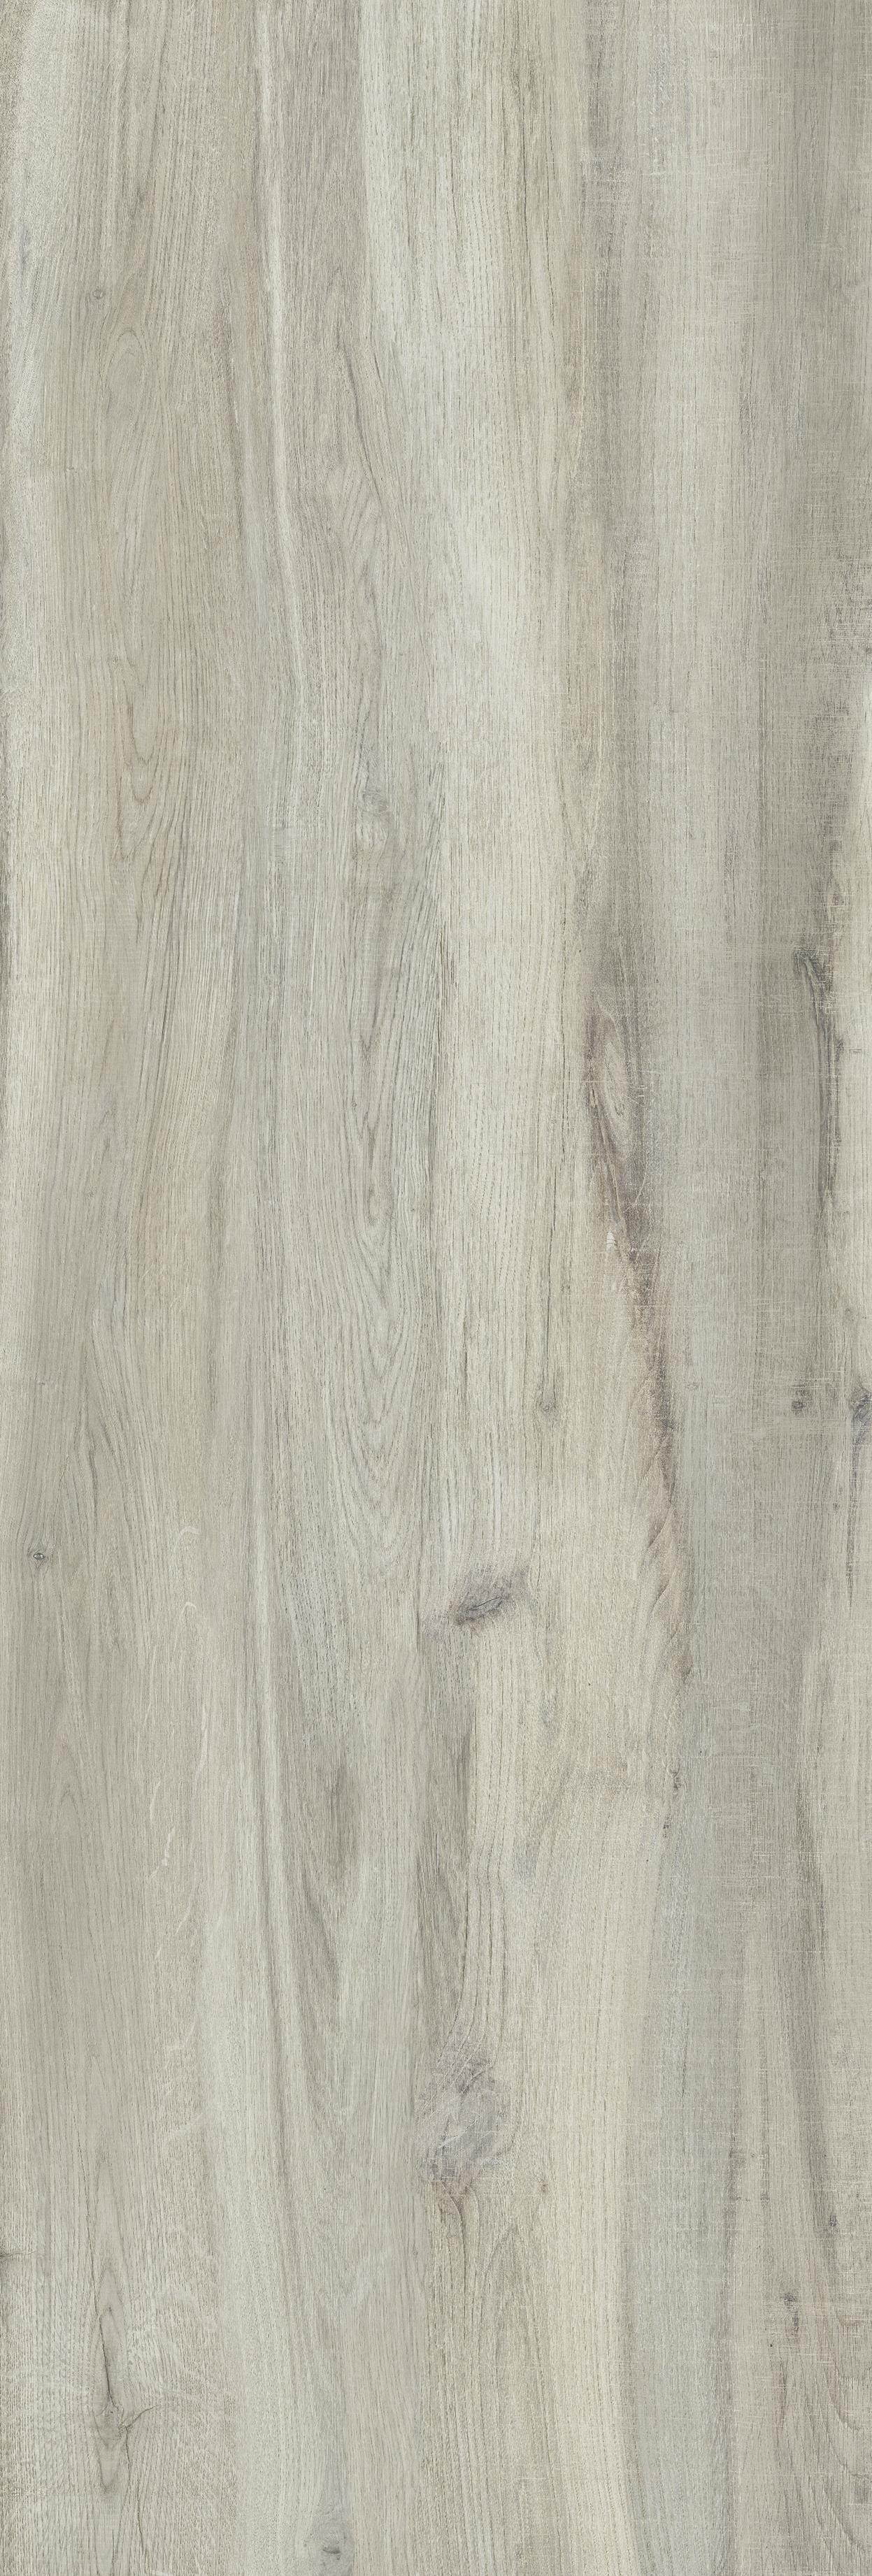 Grove Grey Porcelain Planks 1200x400x20mm – 19.2m2 Pack